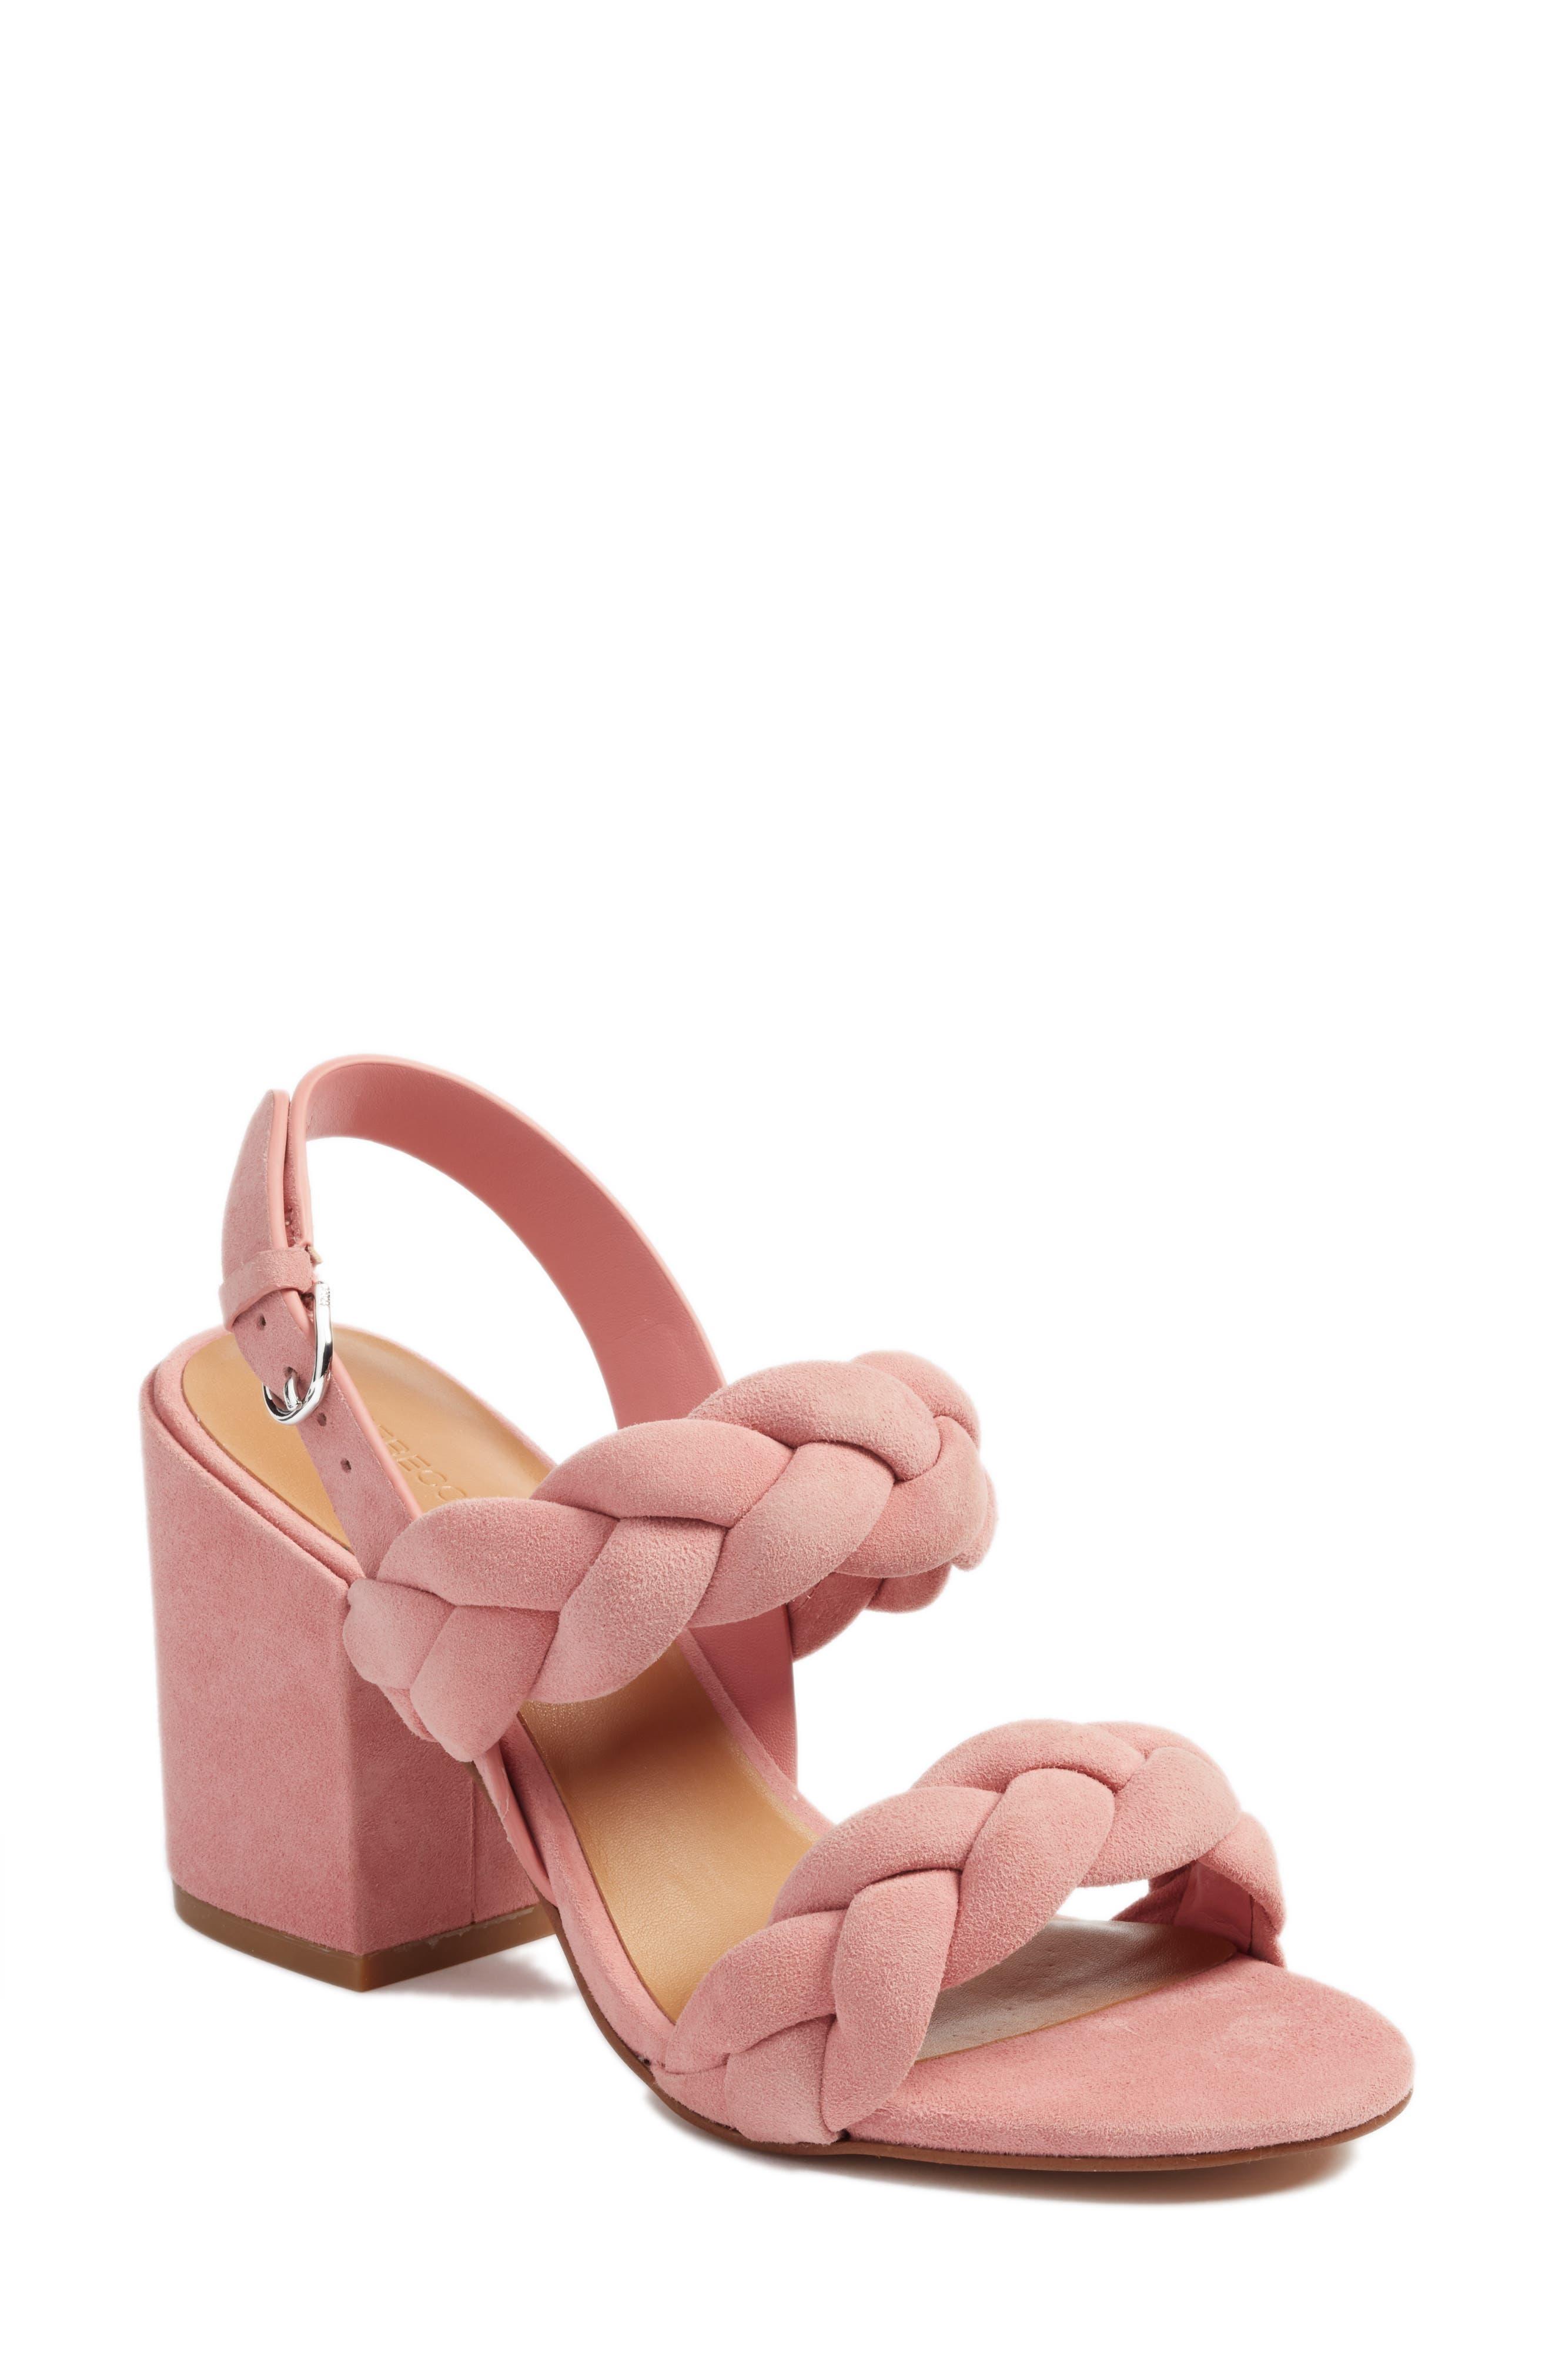 Rebecca Minkoff Candance Block Heel Sandal- Pink